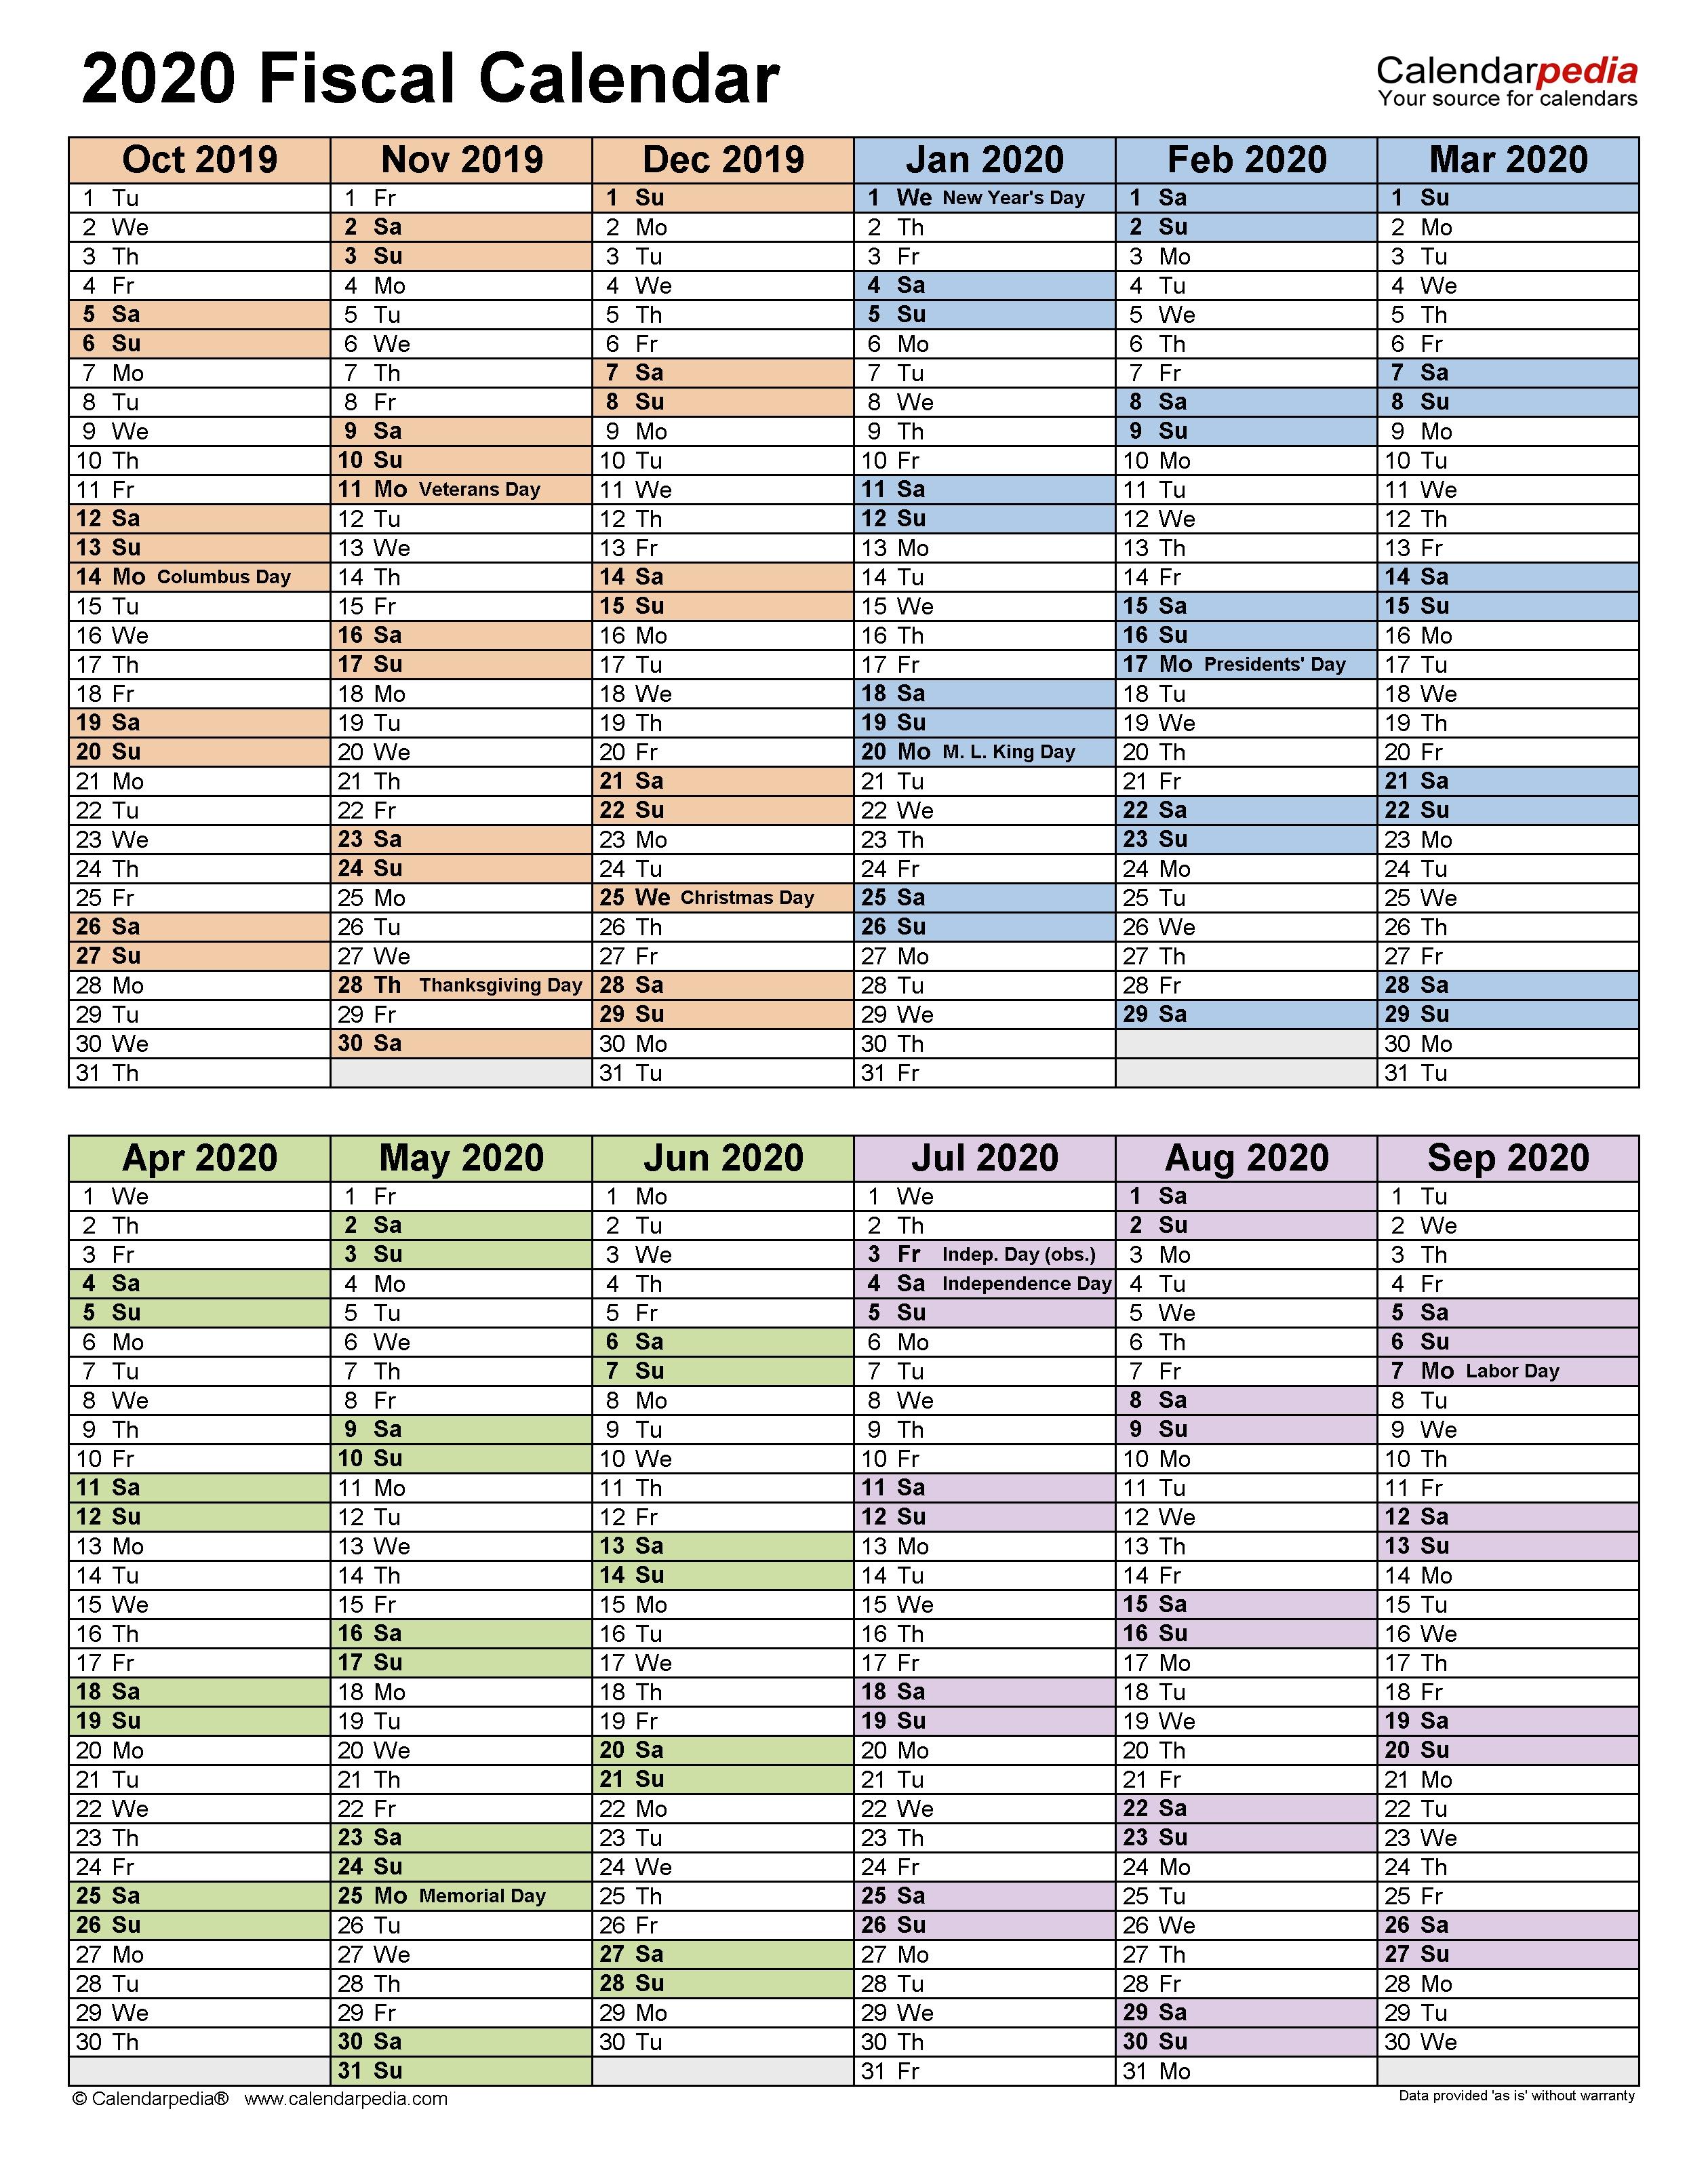 Fiscal Calendars 2020 - Free Printable Pdf Templates for 2020 Fiscal Calendar 4 4 5